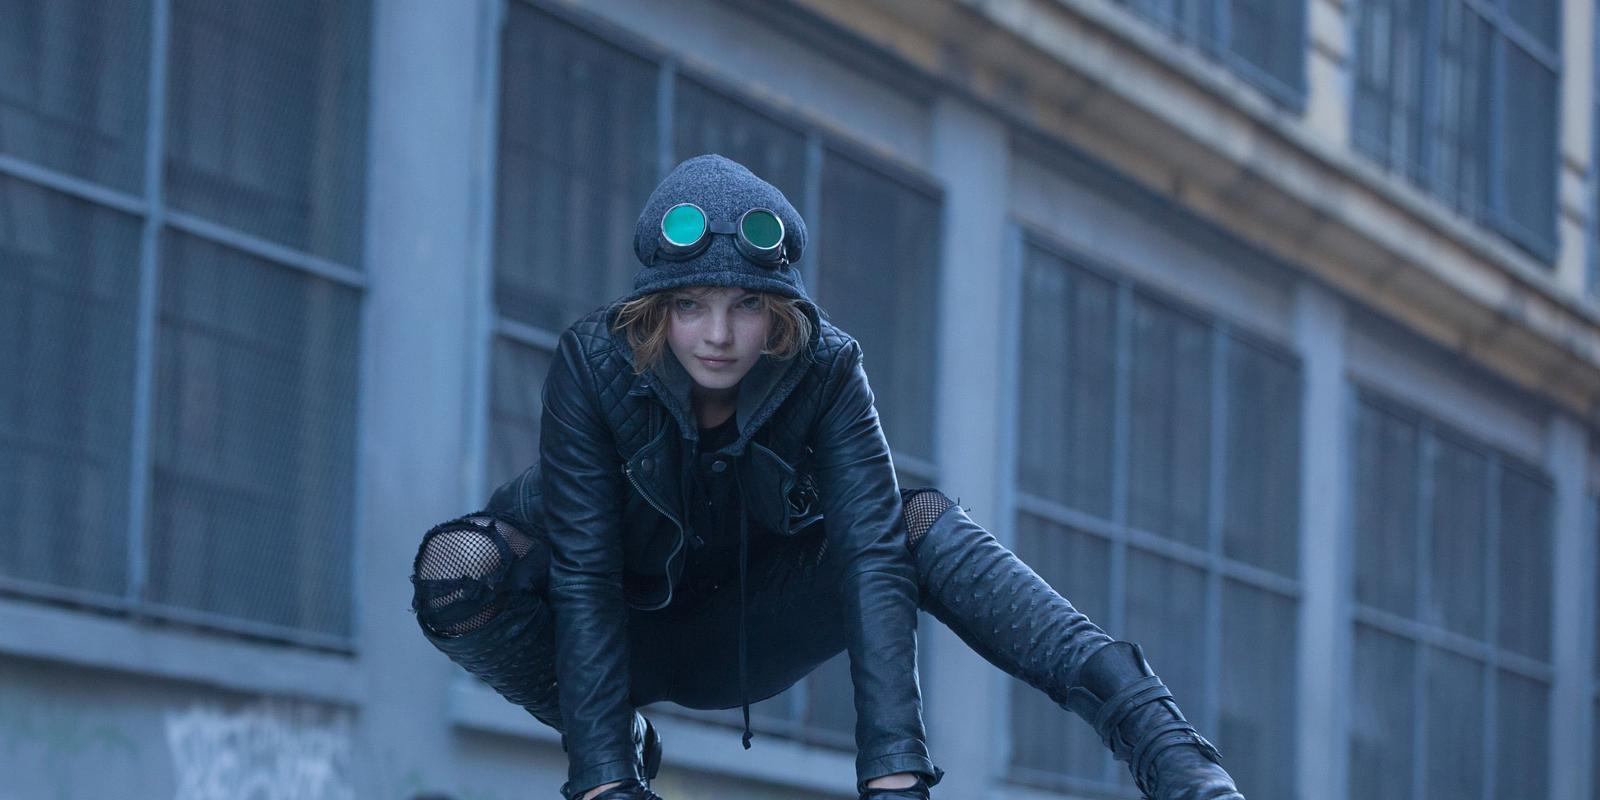 Gotham Season 3.5: Selina Will Enter A 'Dark Phase'